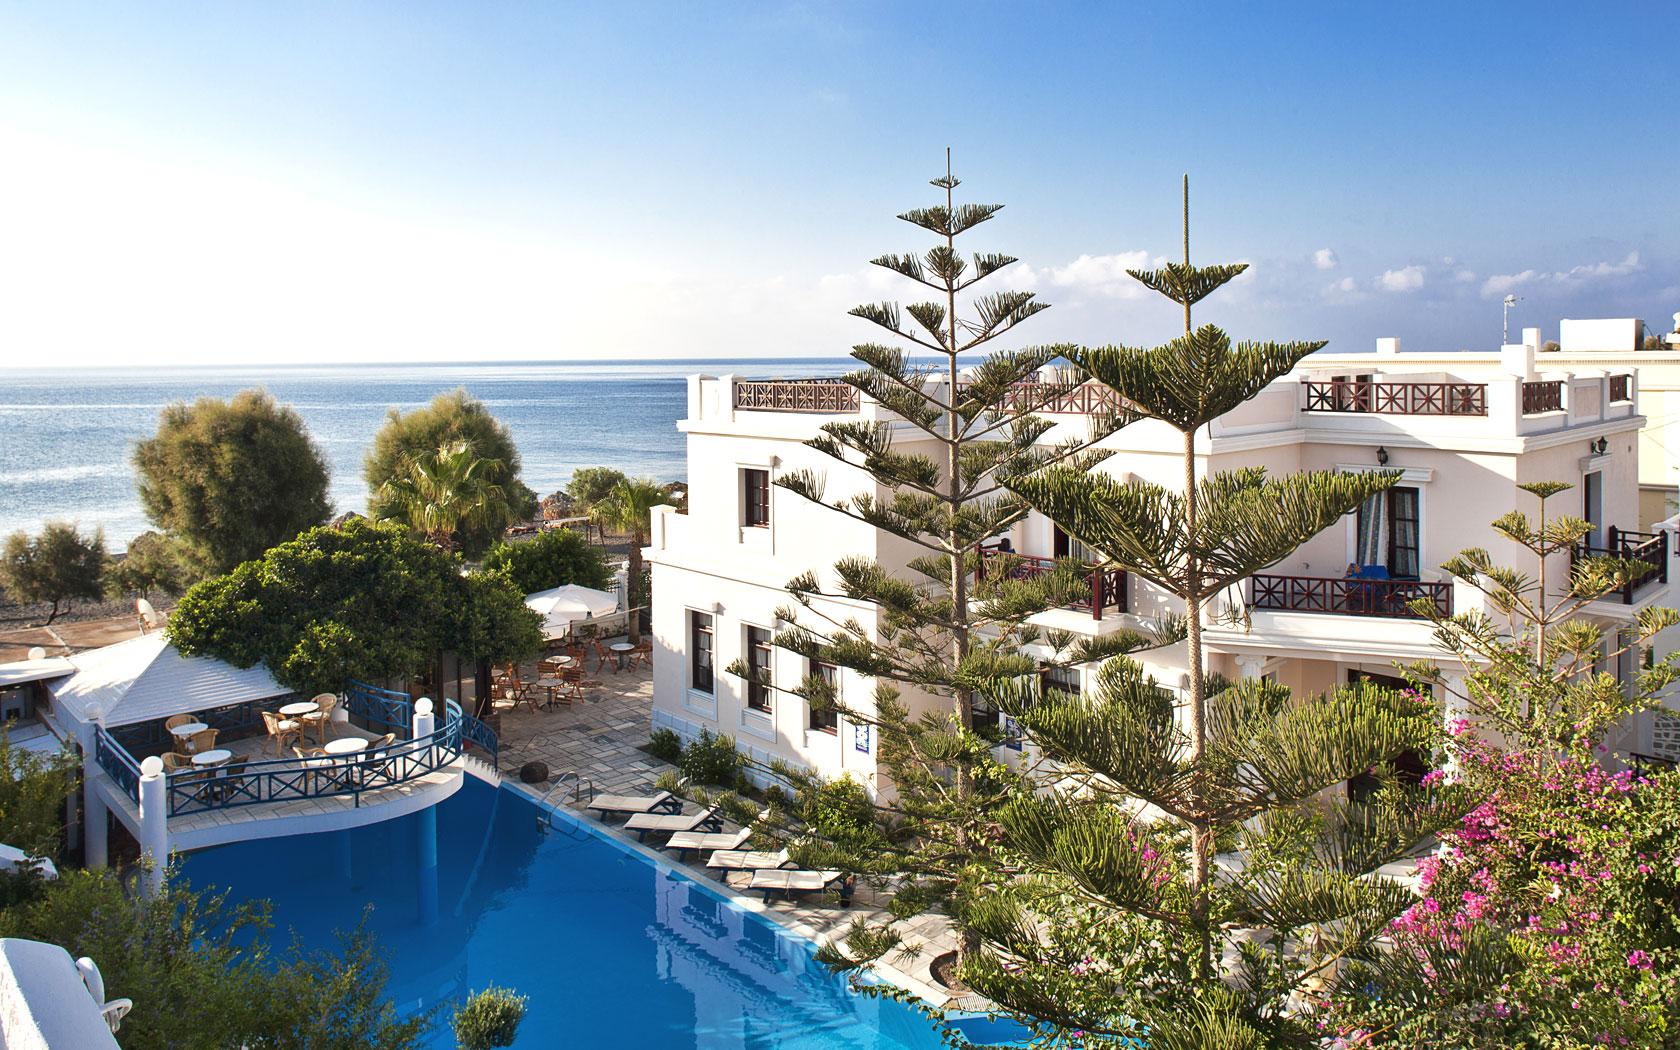 Santorini Hotels Perissa Veggera Hotel Santorini 1680x1050